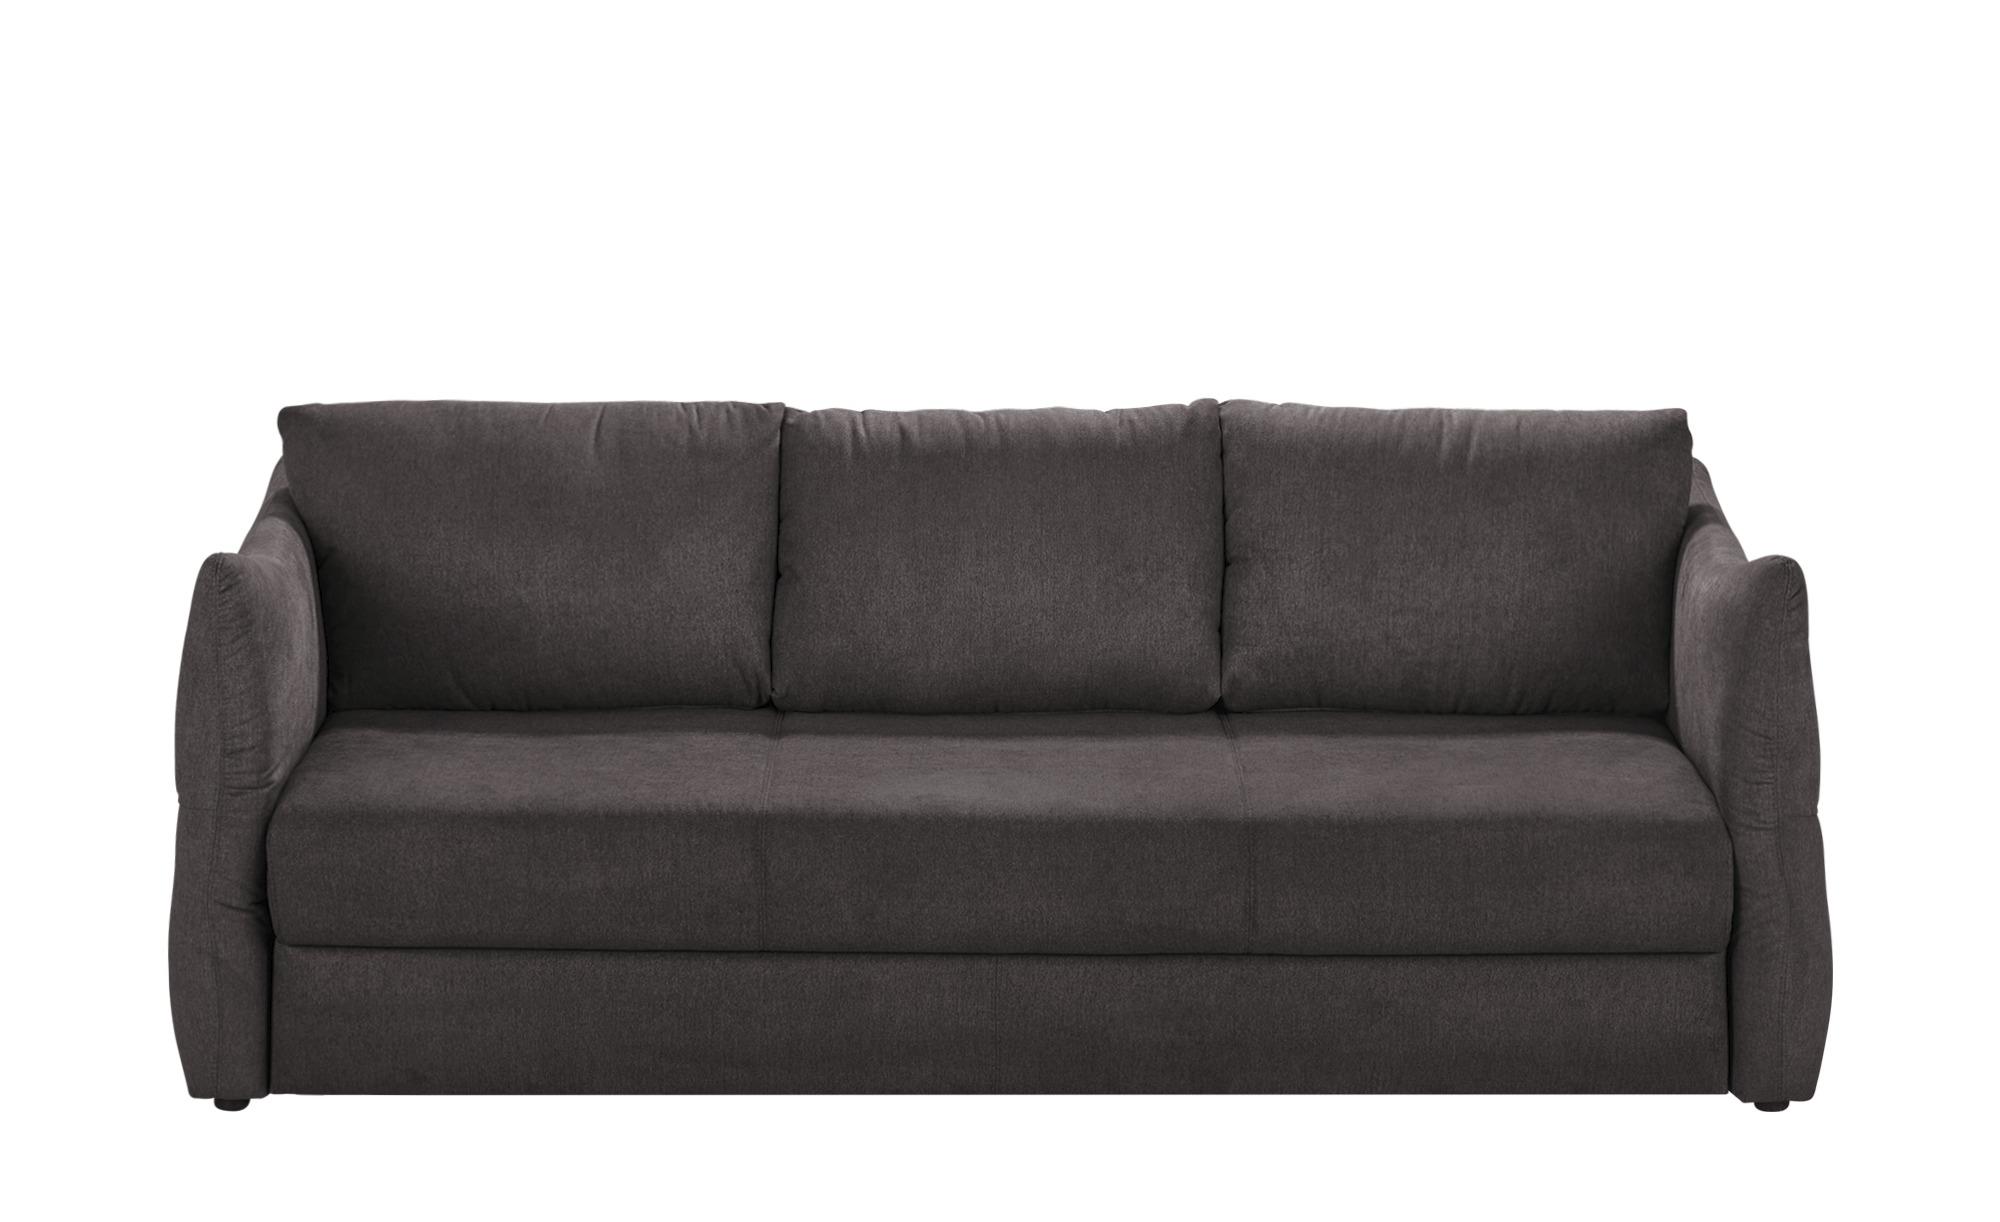 smart Sofa 3-sitzig dunkelgrau - Webstoff Franziska ¦ grau ¦ Maße (cm): B: 226 H: 87 T: 100 Polstermöbel > Sofas > 3-Sitzer - Höffner